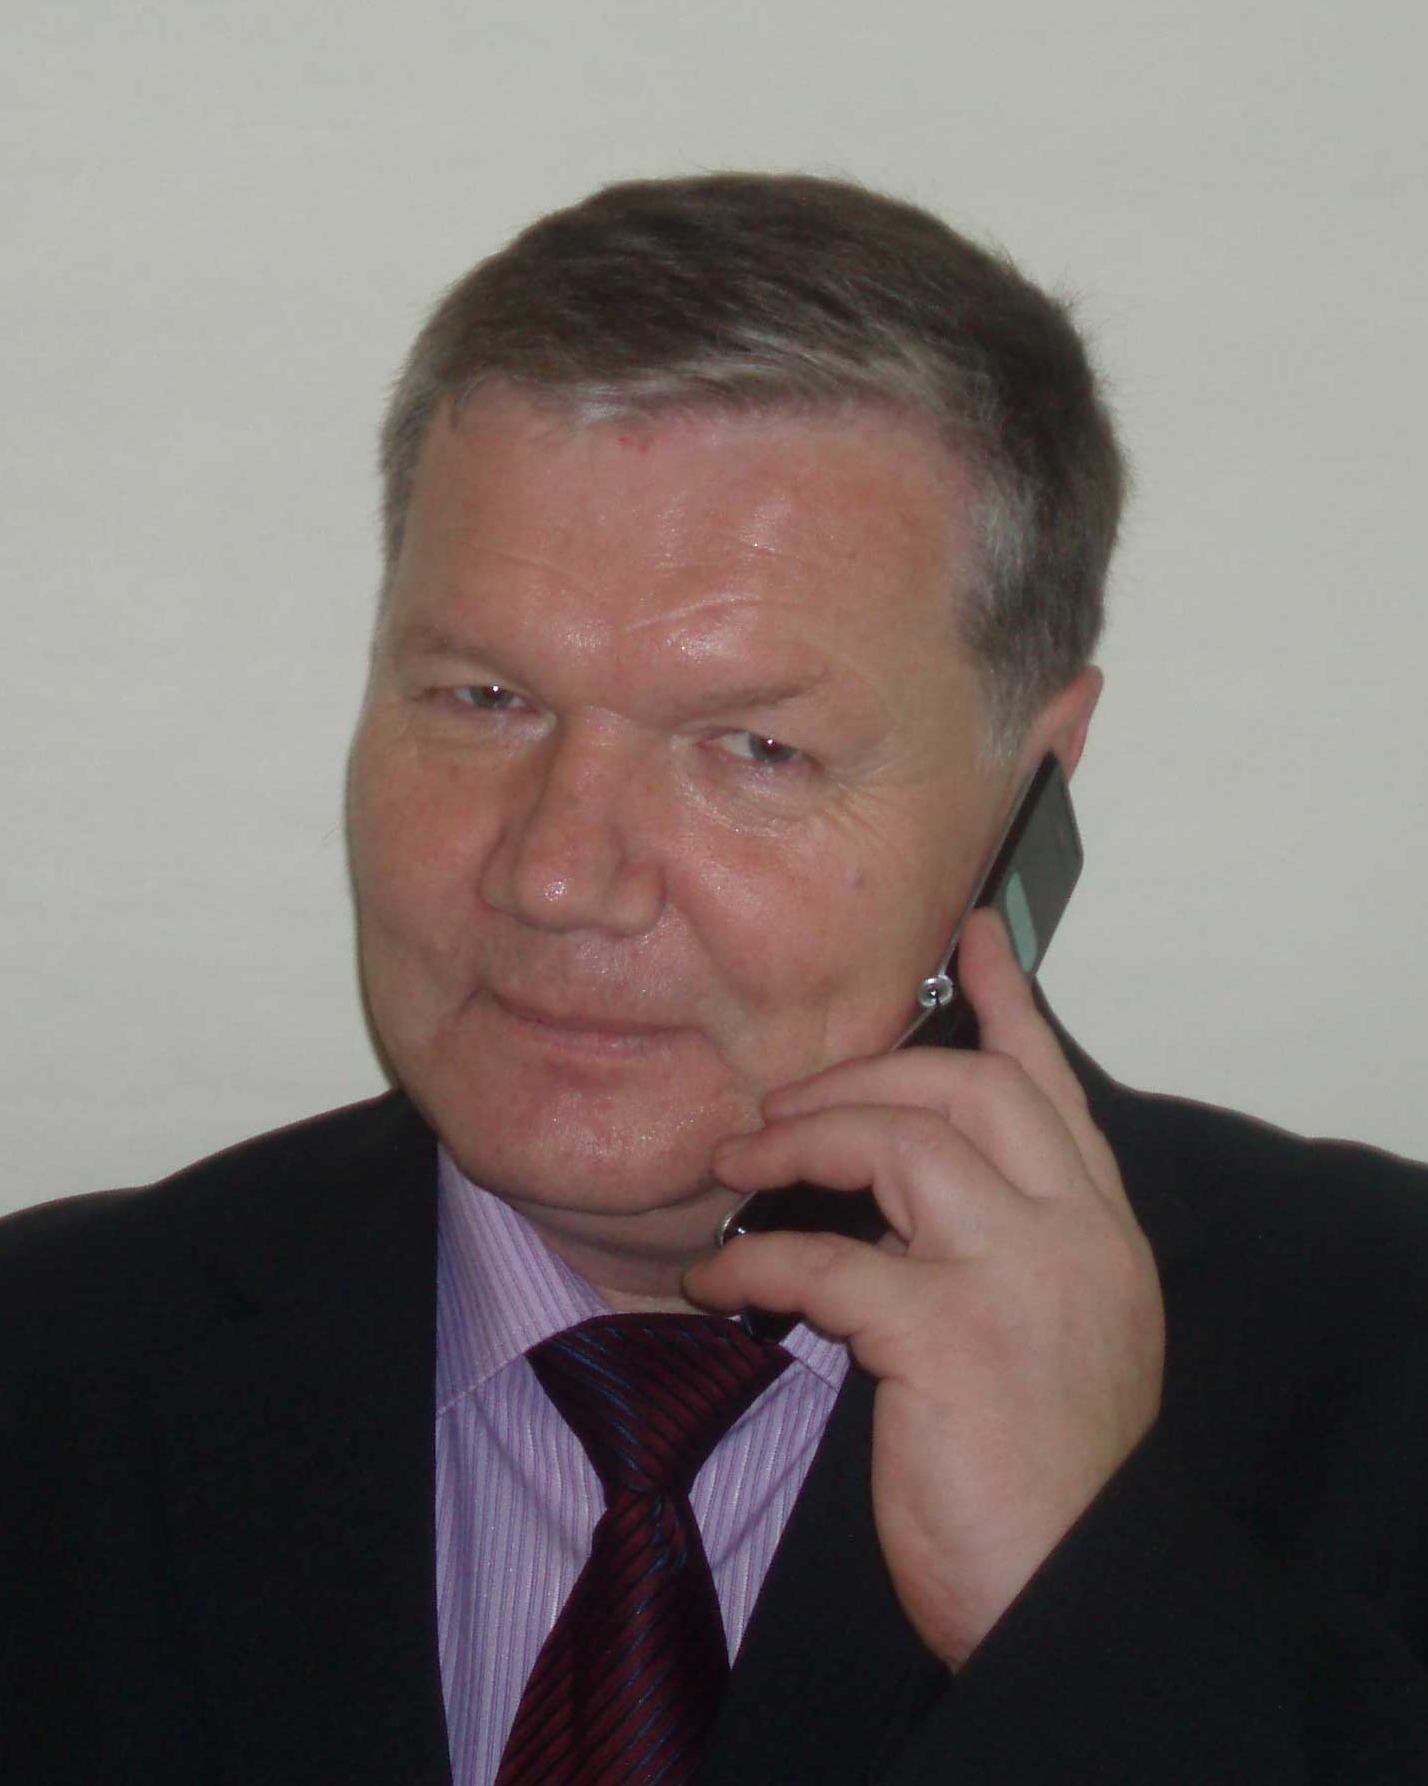 Богомолов Александр Павлович на 50-летии